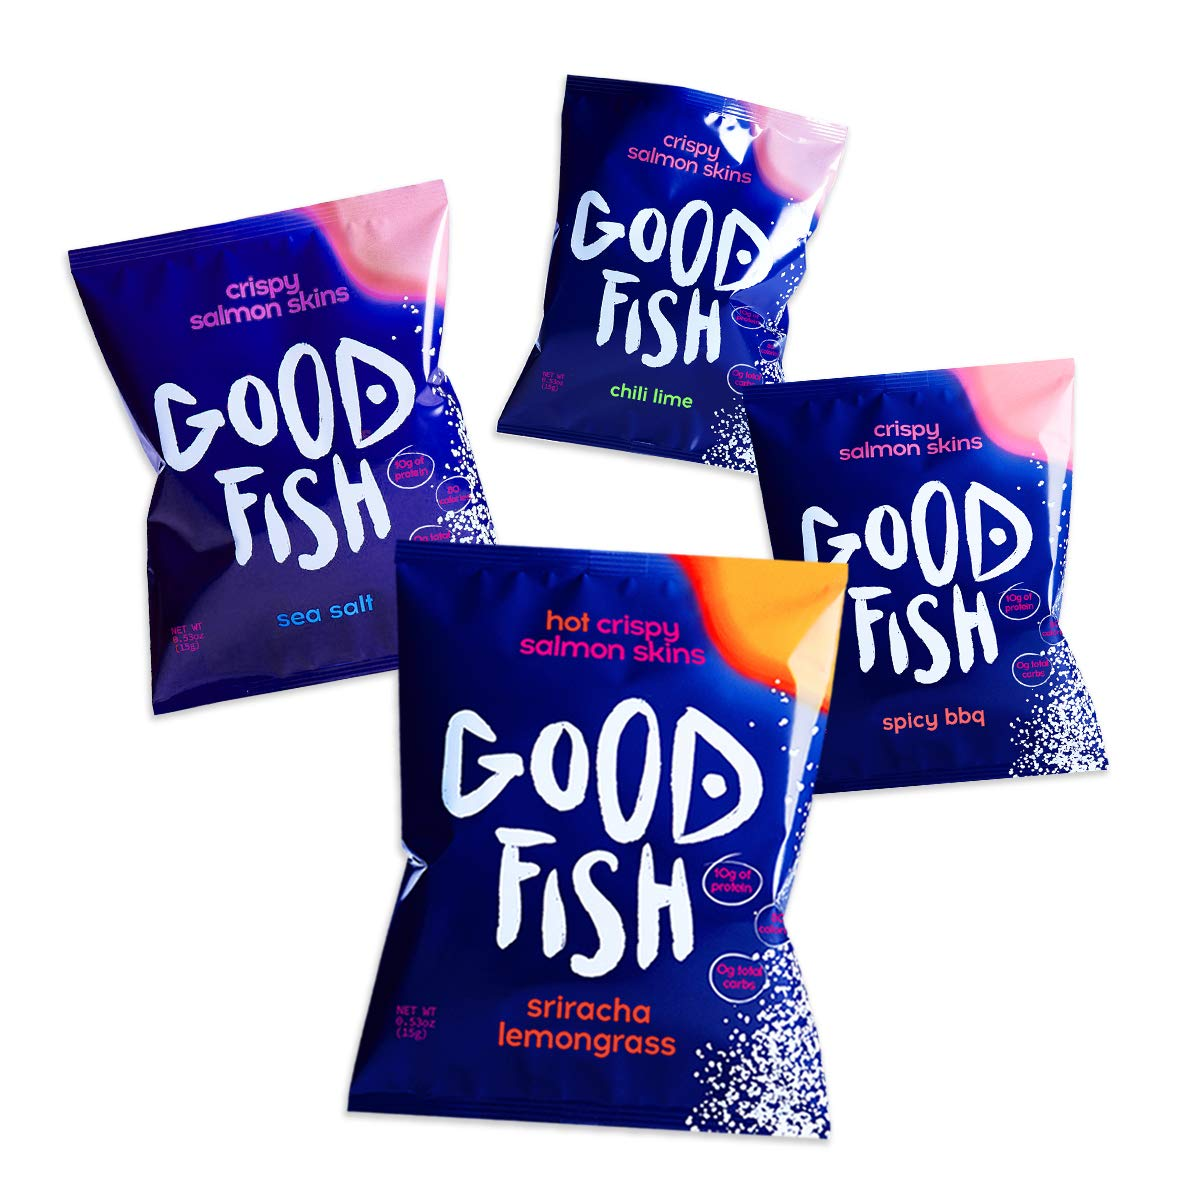 GOODFISH Crispy Salmon Skin Chips - Hot Variety Pack (Pack of 8)